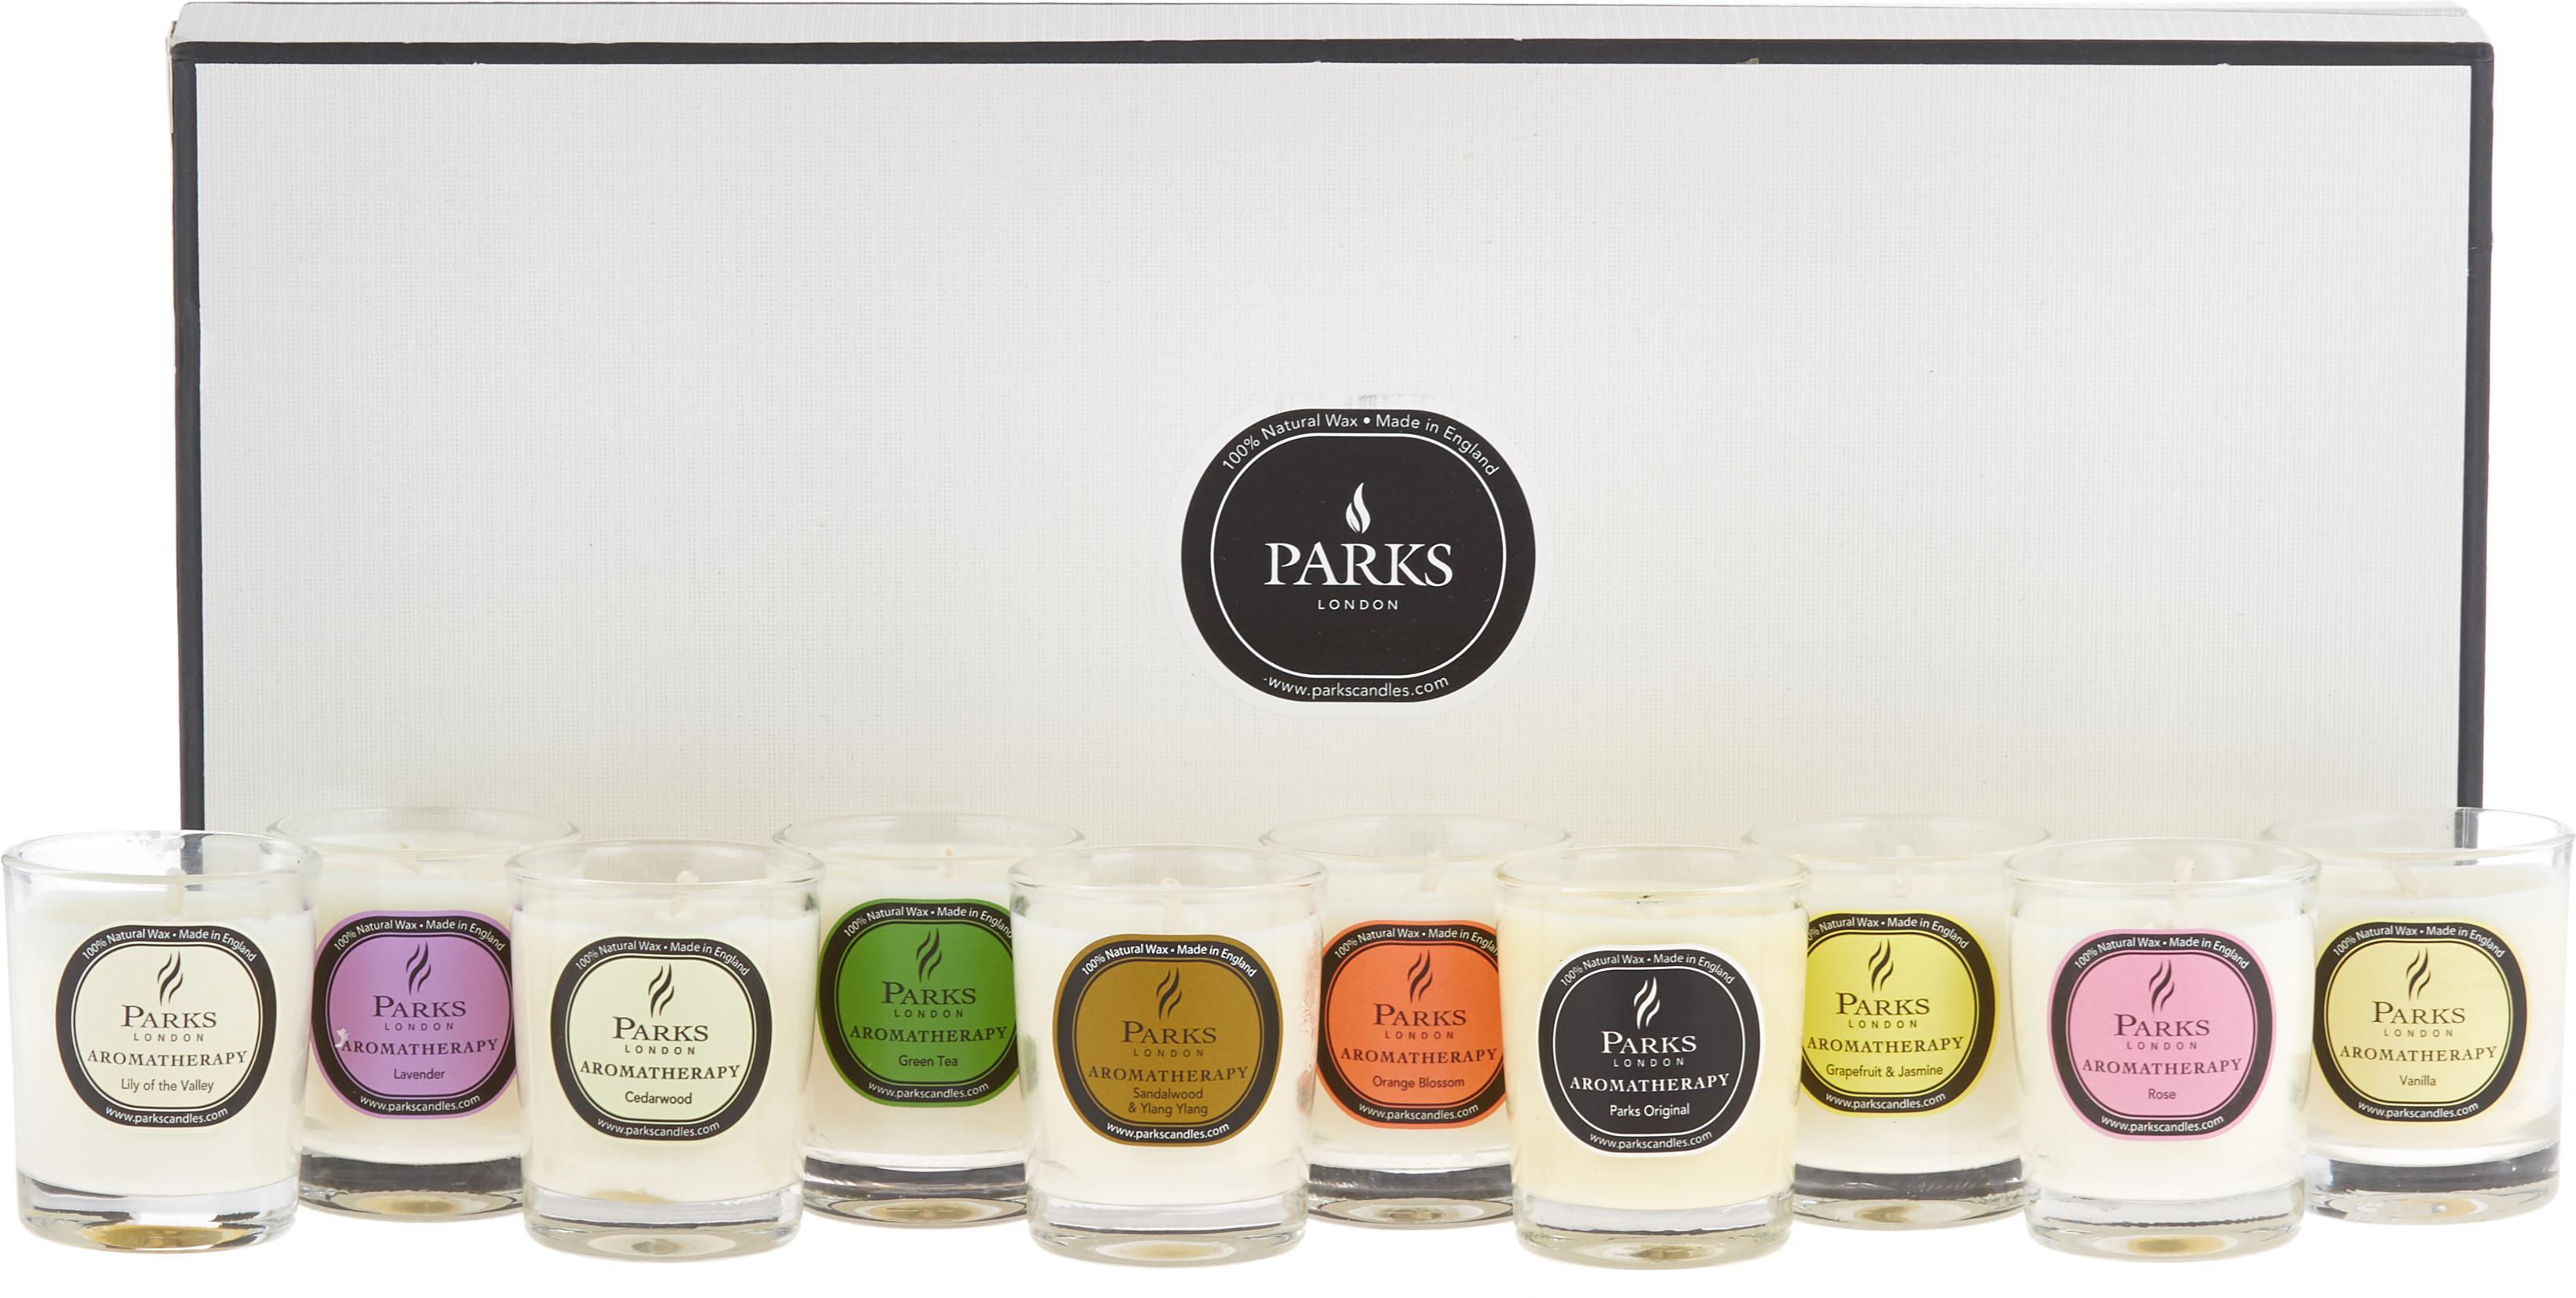 Duftkerzen-Set Aromatherapy, 10-tlg., Behälter: Glas, Mehrfarbig, Ø 5 x H 6 cm